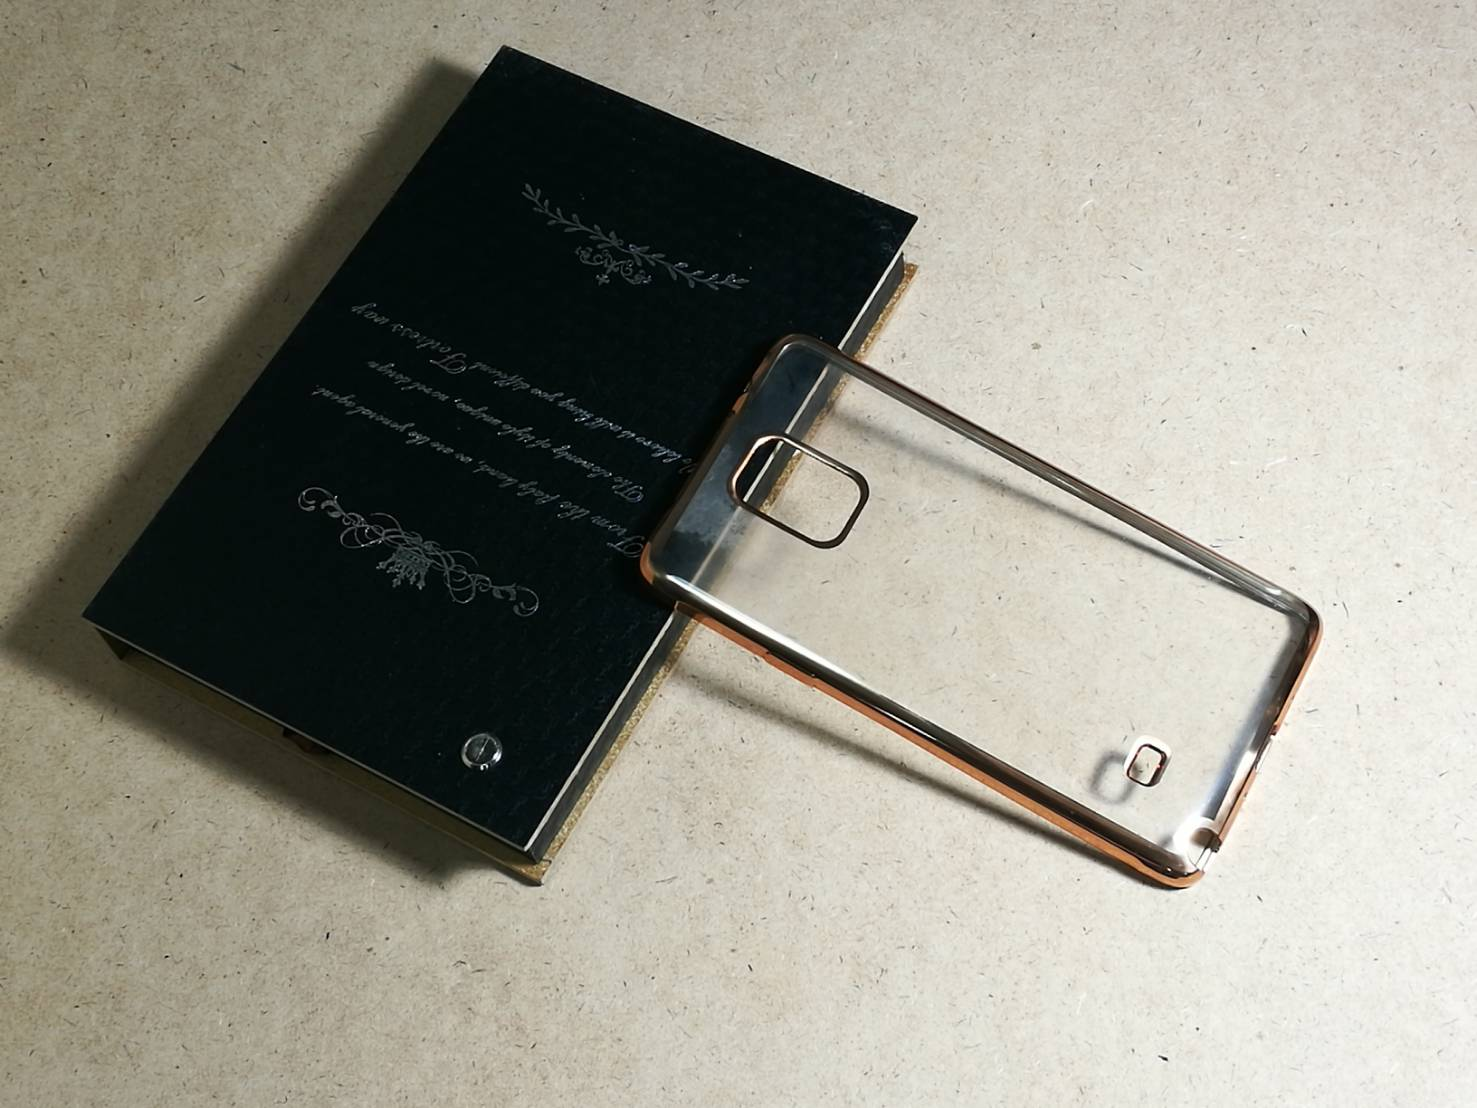 Case Samsung Note 3 นิ่มใสขอบทอง